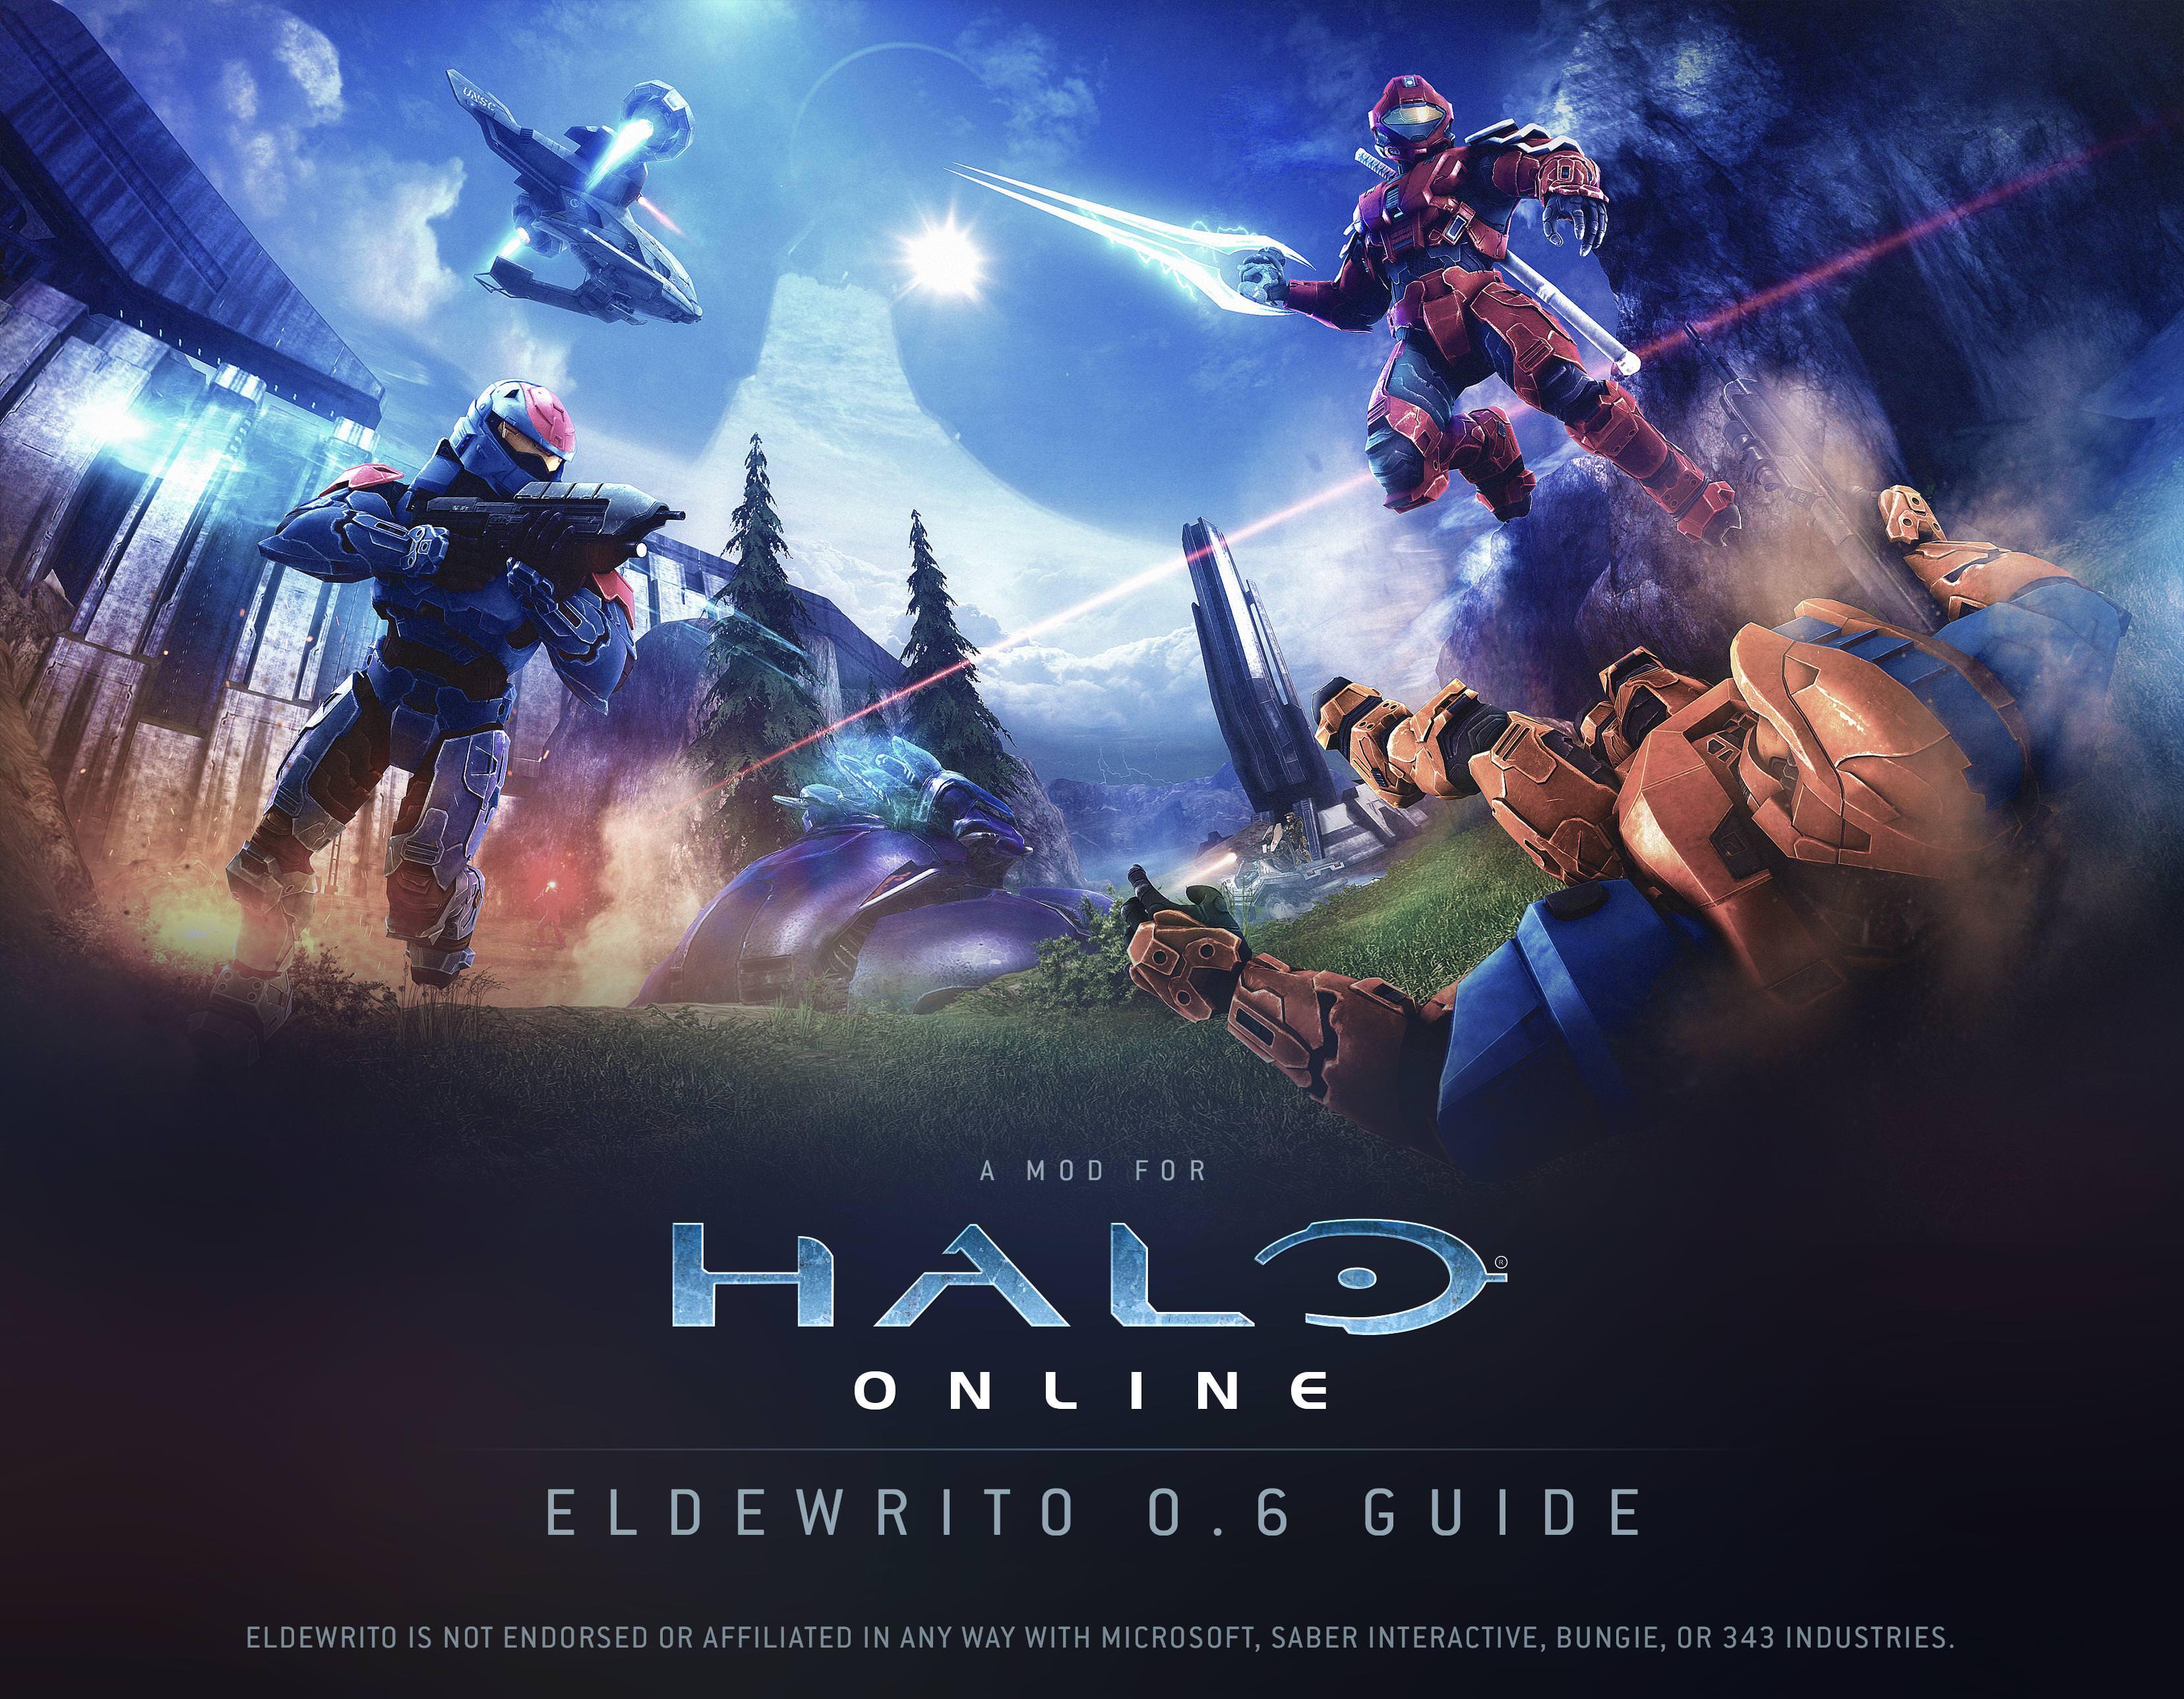 Microsoft Shuts Down Halo Online Fan Mod Eldewrito Thats It Guys